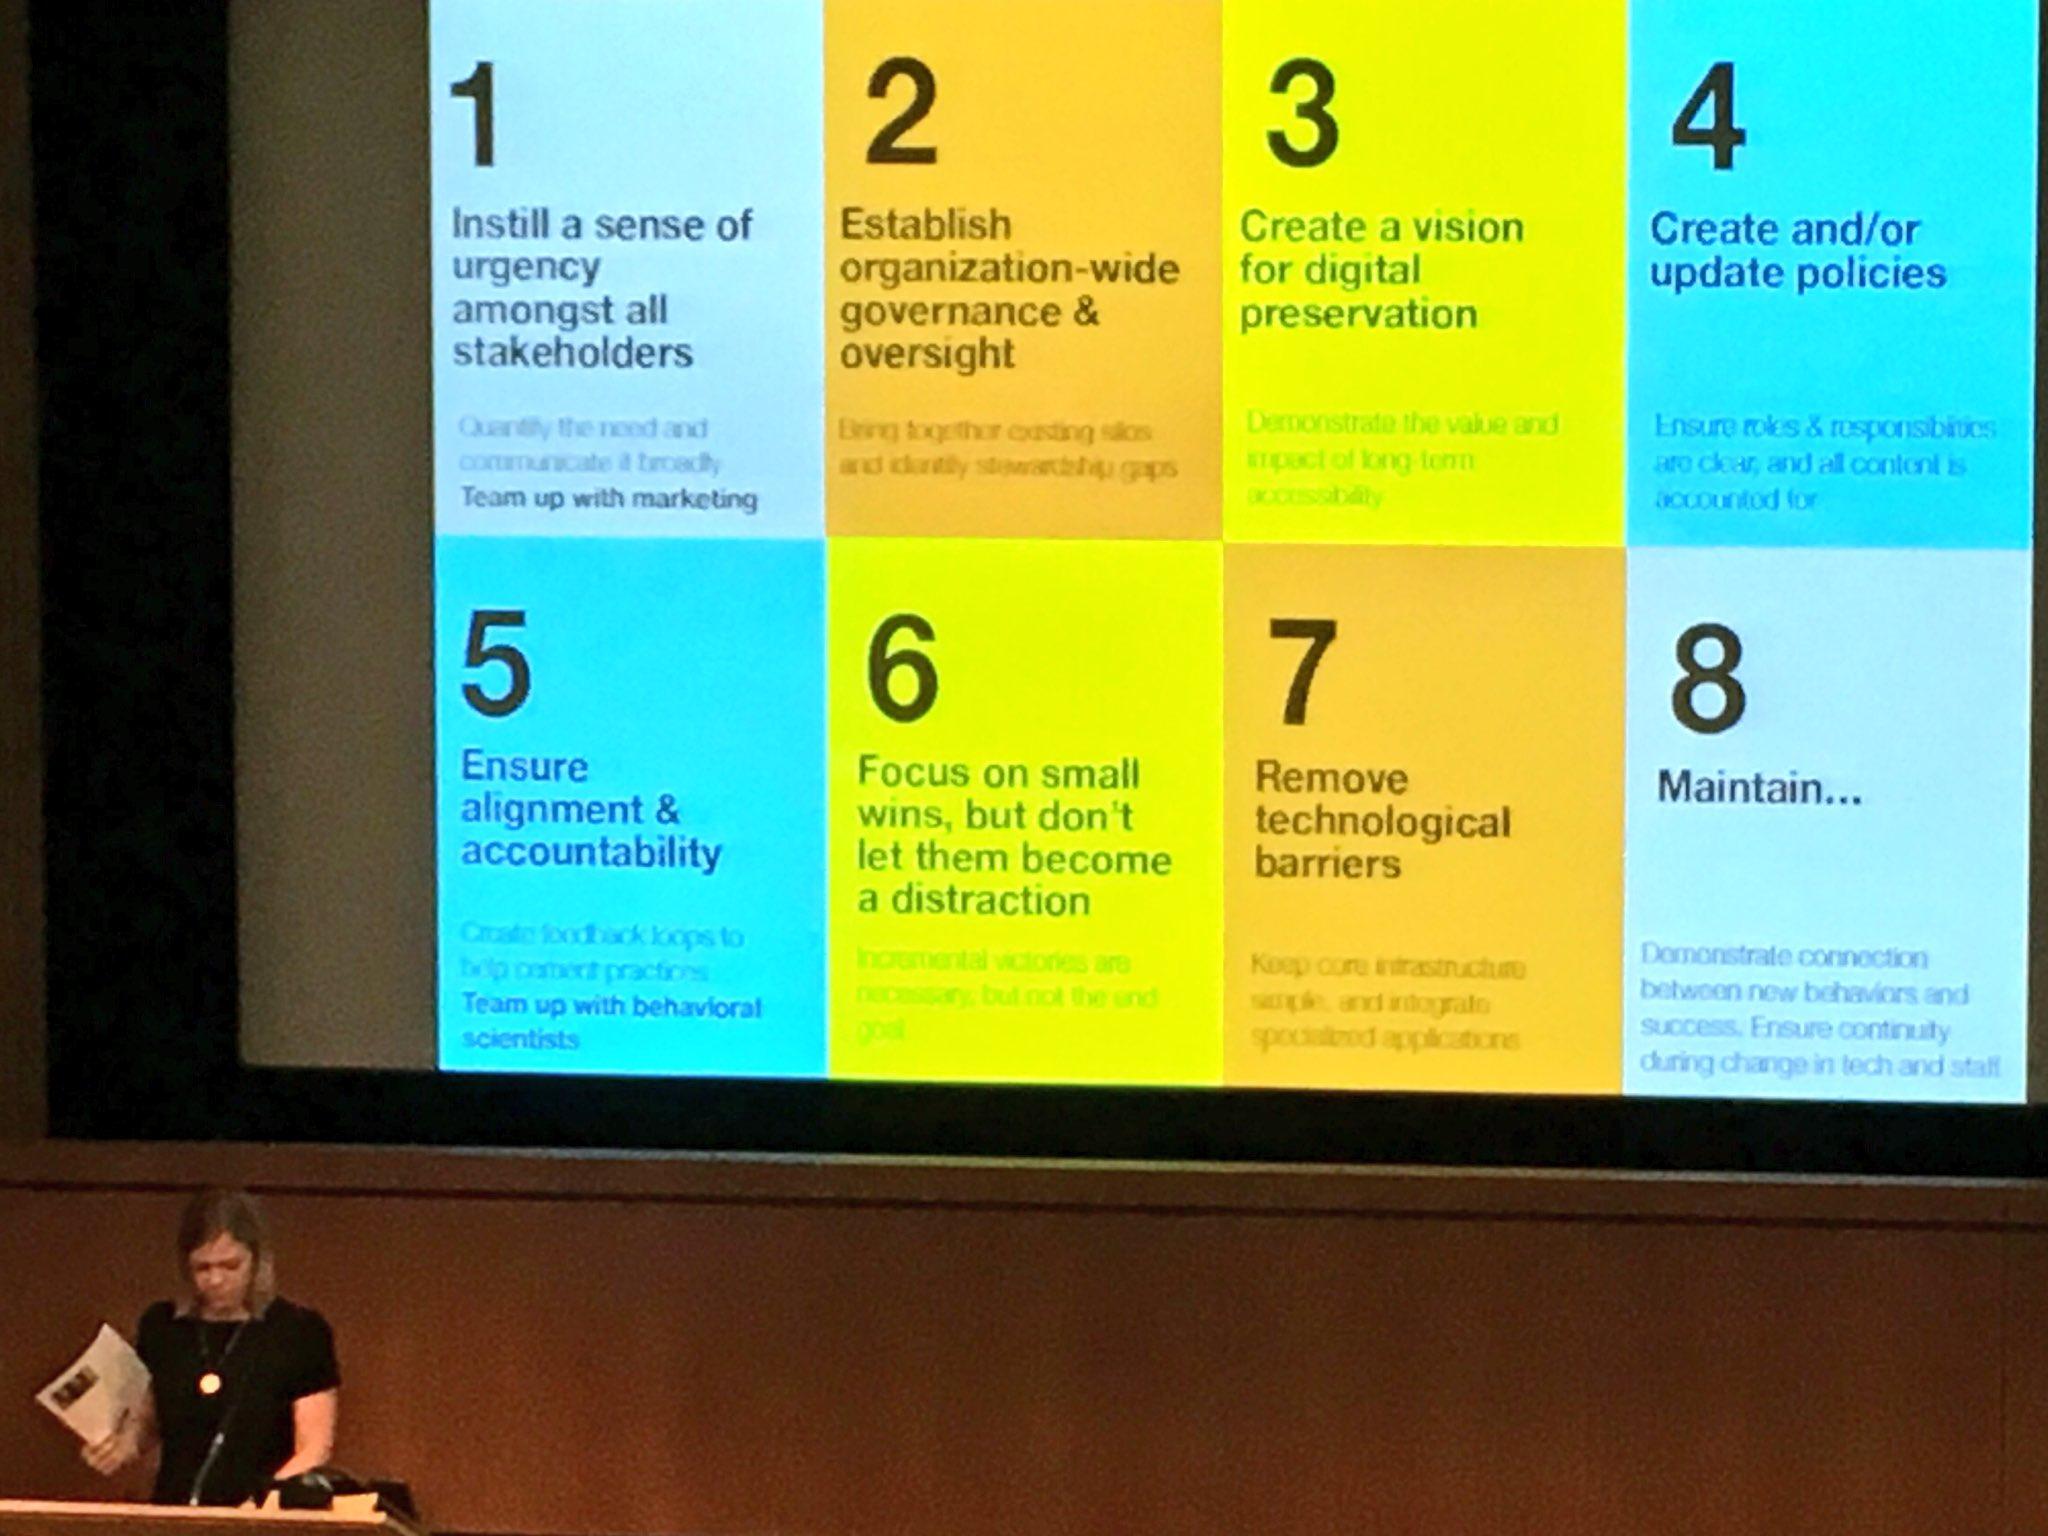 Key tips to cap off @kvanmalssen keynote at  #PERIconf2016 @PericlesFP7 #dpc https://t.co/1Wv6UQZkit